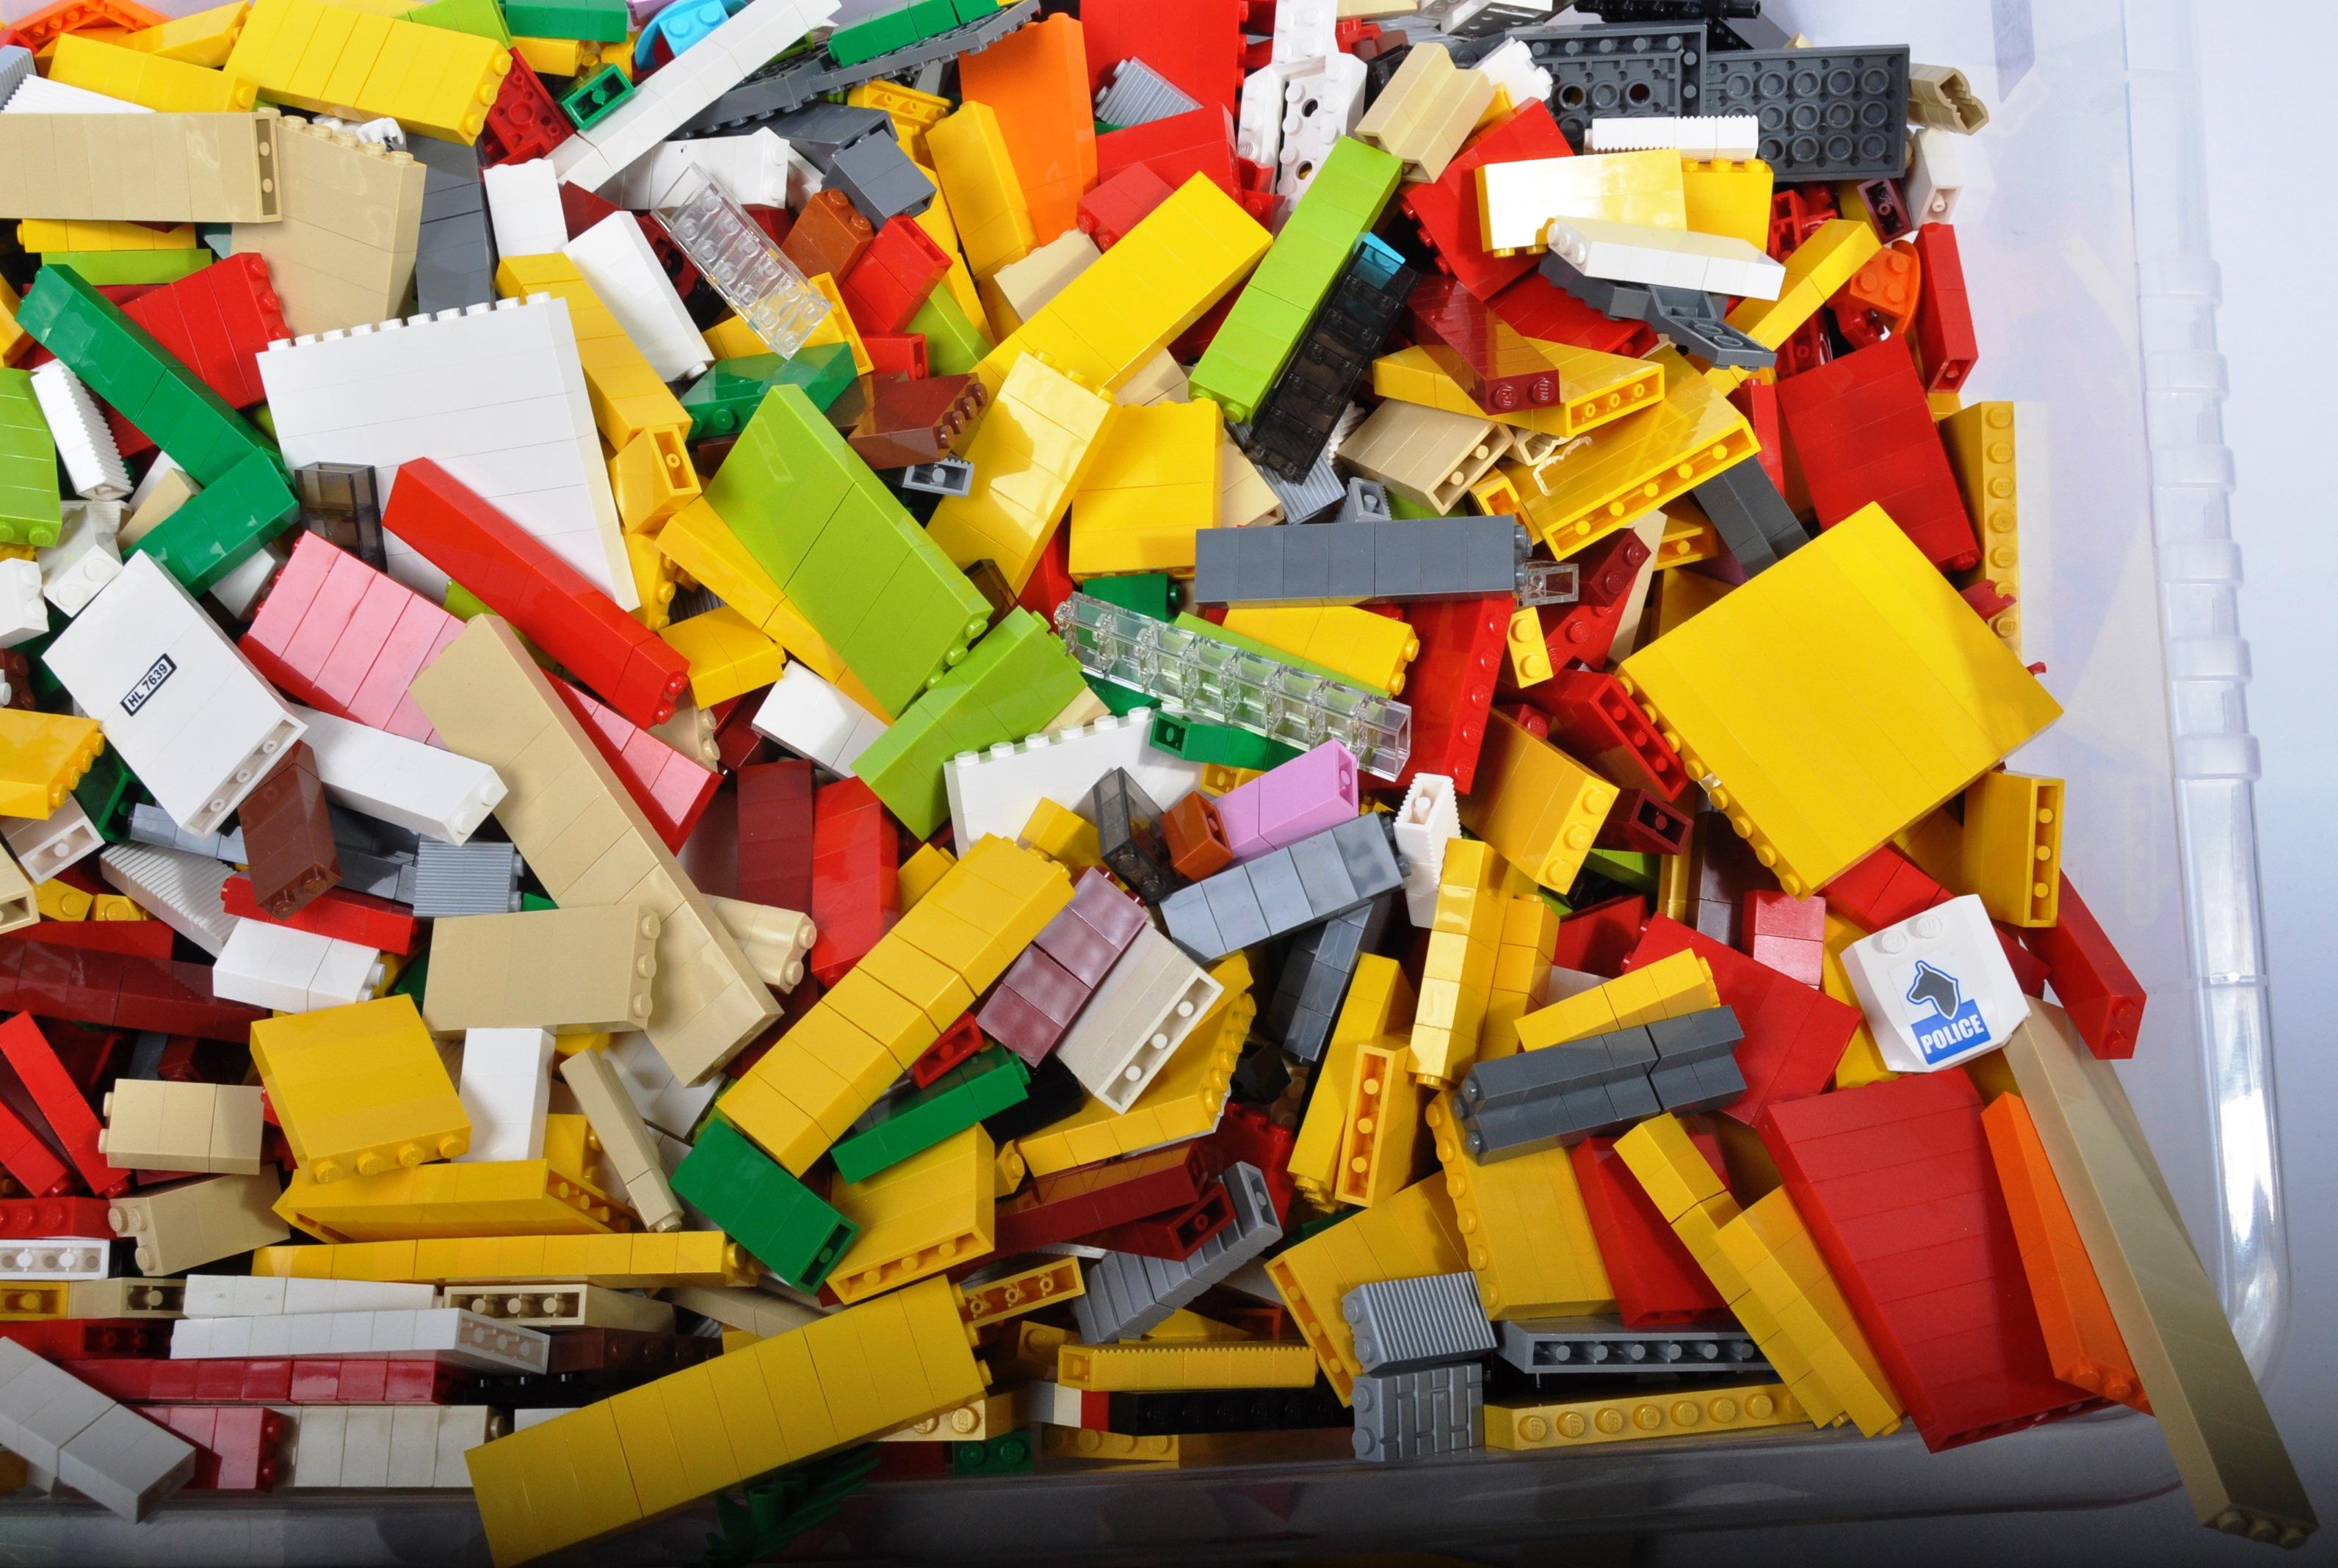 LARGE QUANTITY OF ASSORTED LOOSE LEGO BRICKS - Image 3 of 5